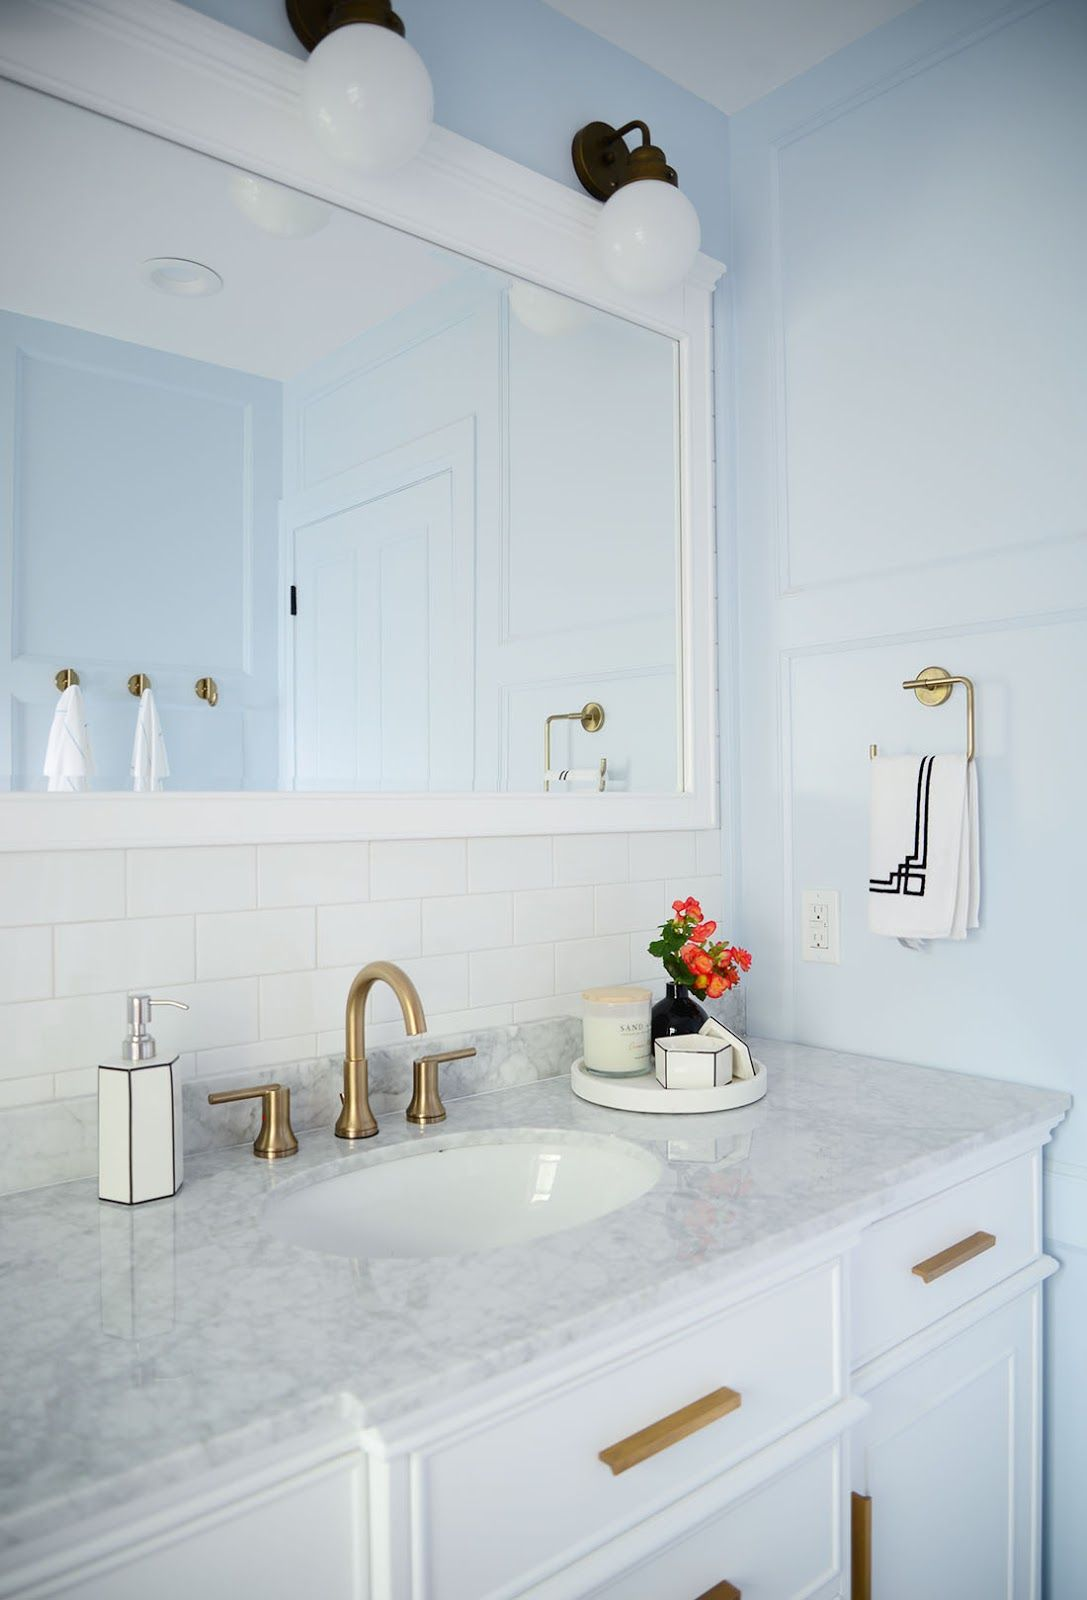 French Style Bathroom Renovation Bathroom Remodel Pictures Home Depot Bathroom Bathroom Interior Design